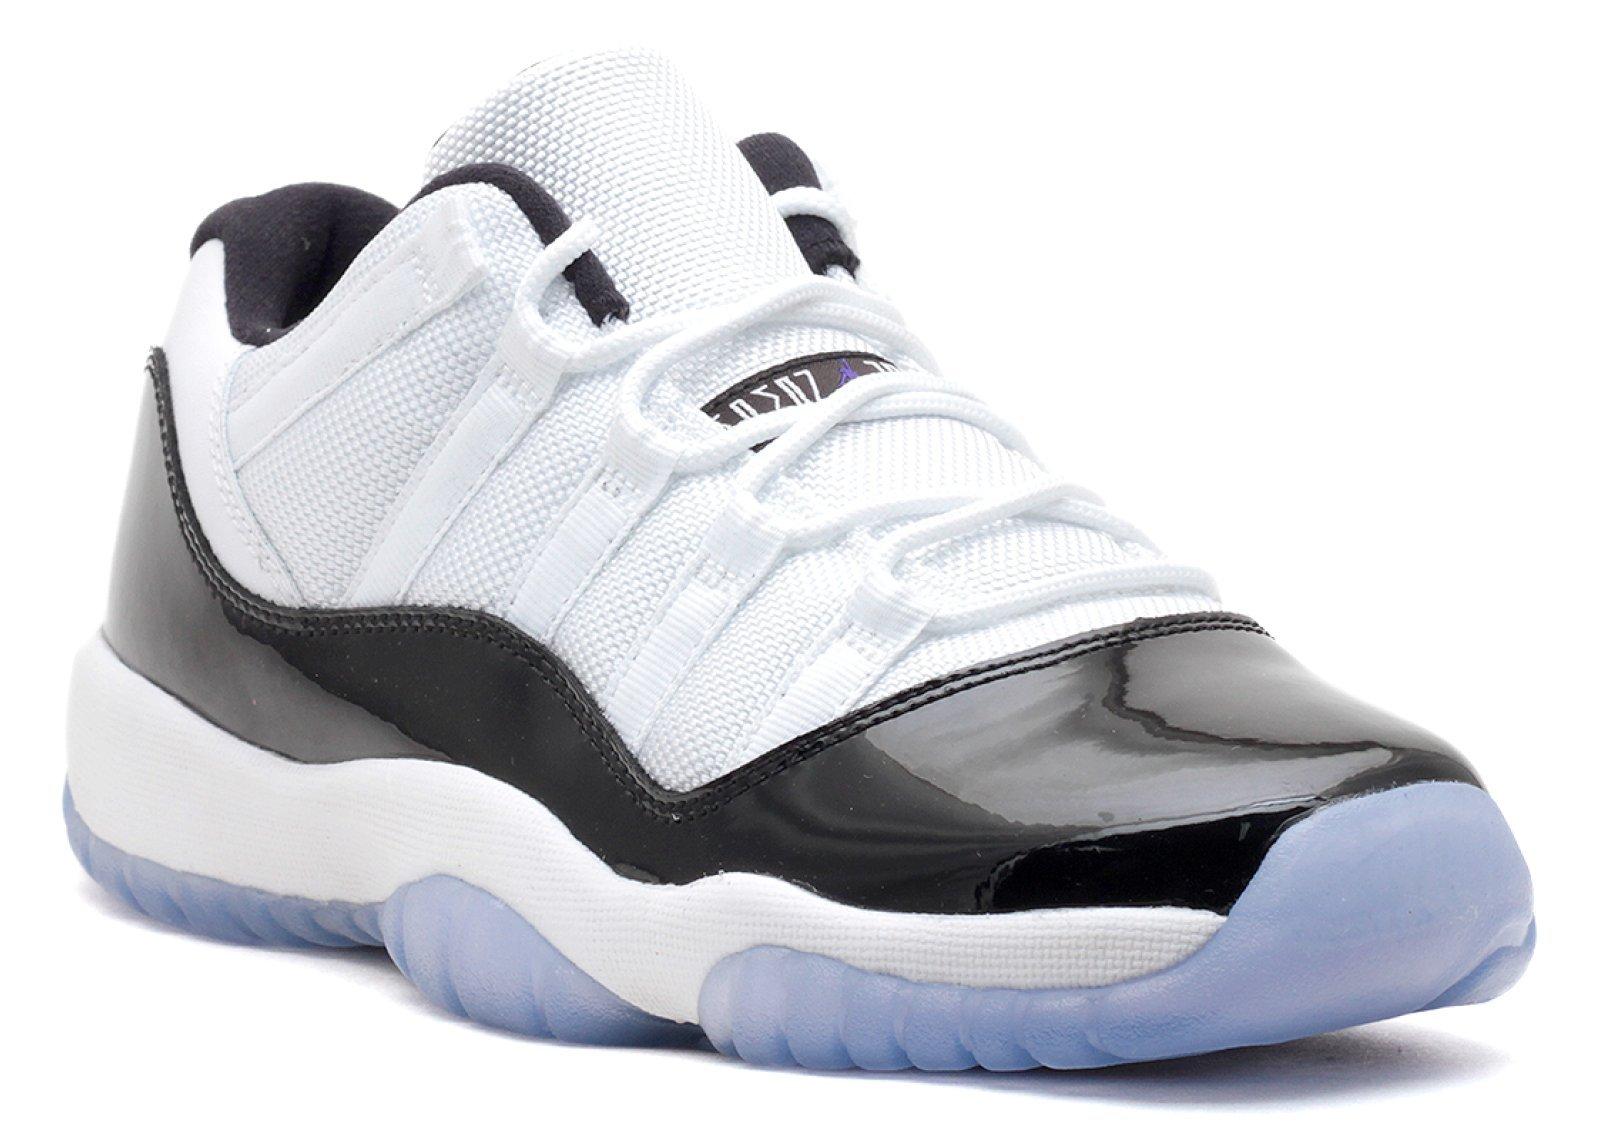 Jordan Gradeschool 11 Retro Low Bg White/Black-Dark Concord 528896-153 4 by Jordan